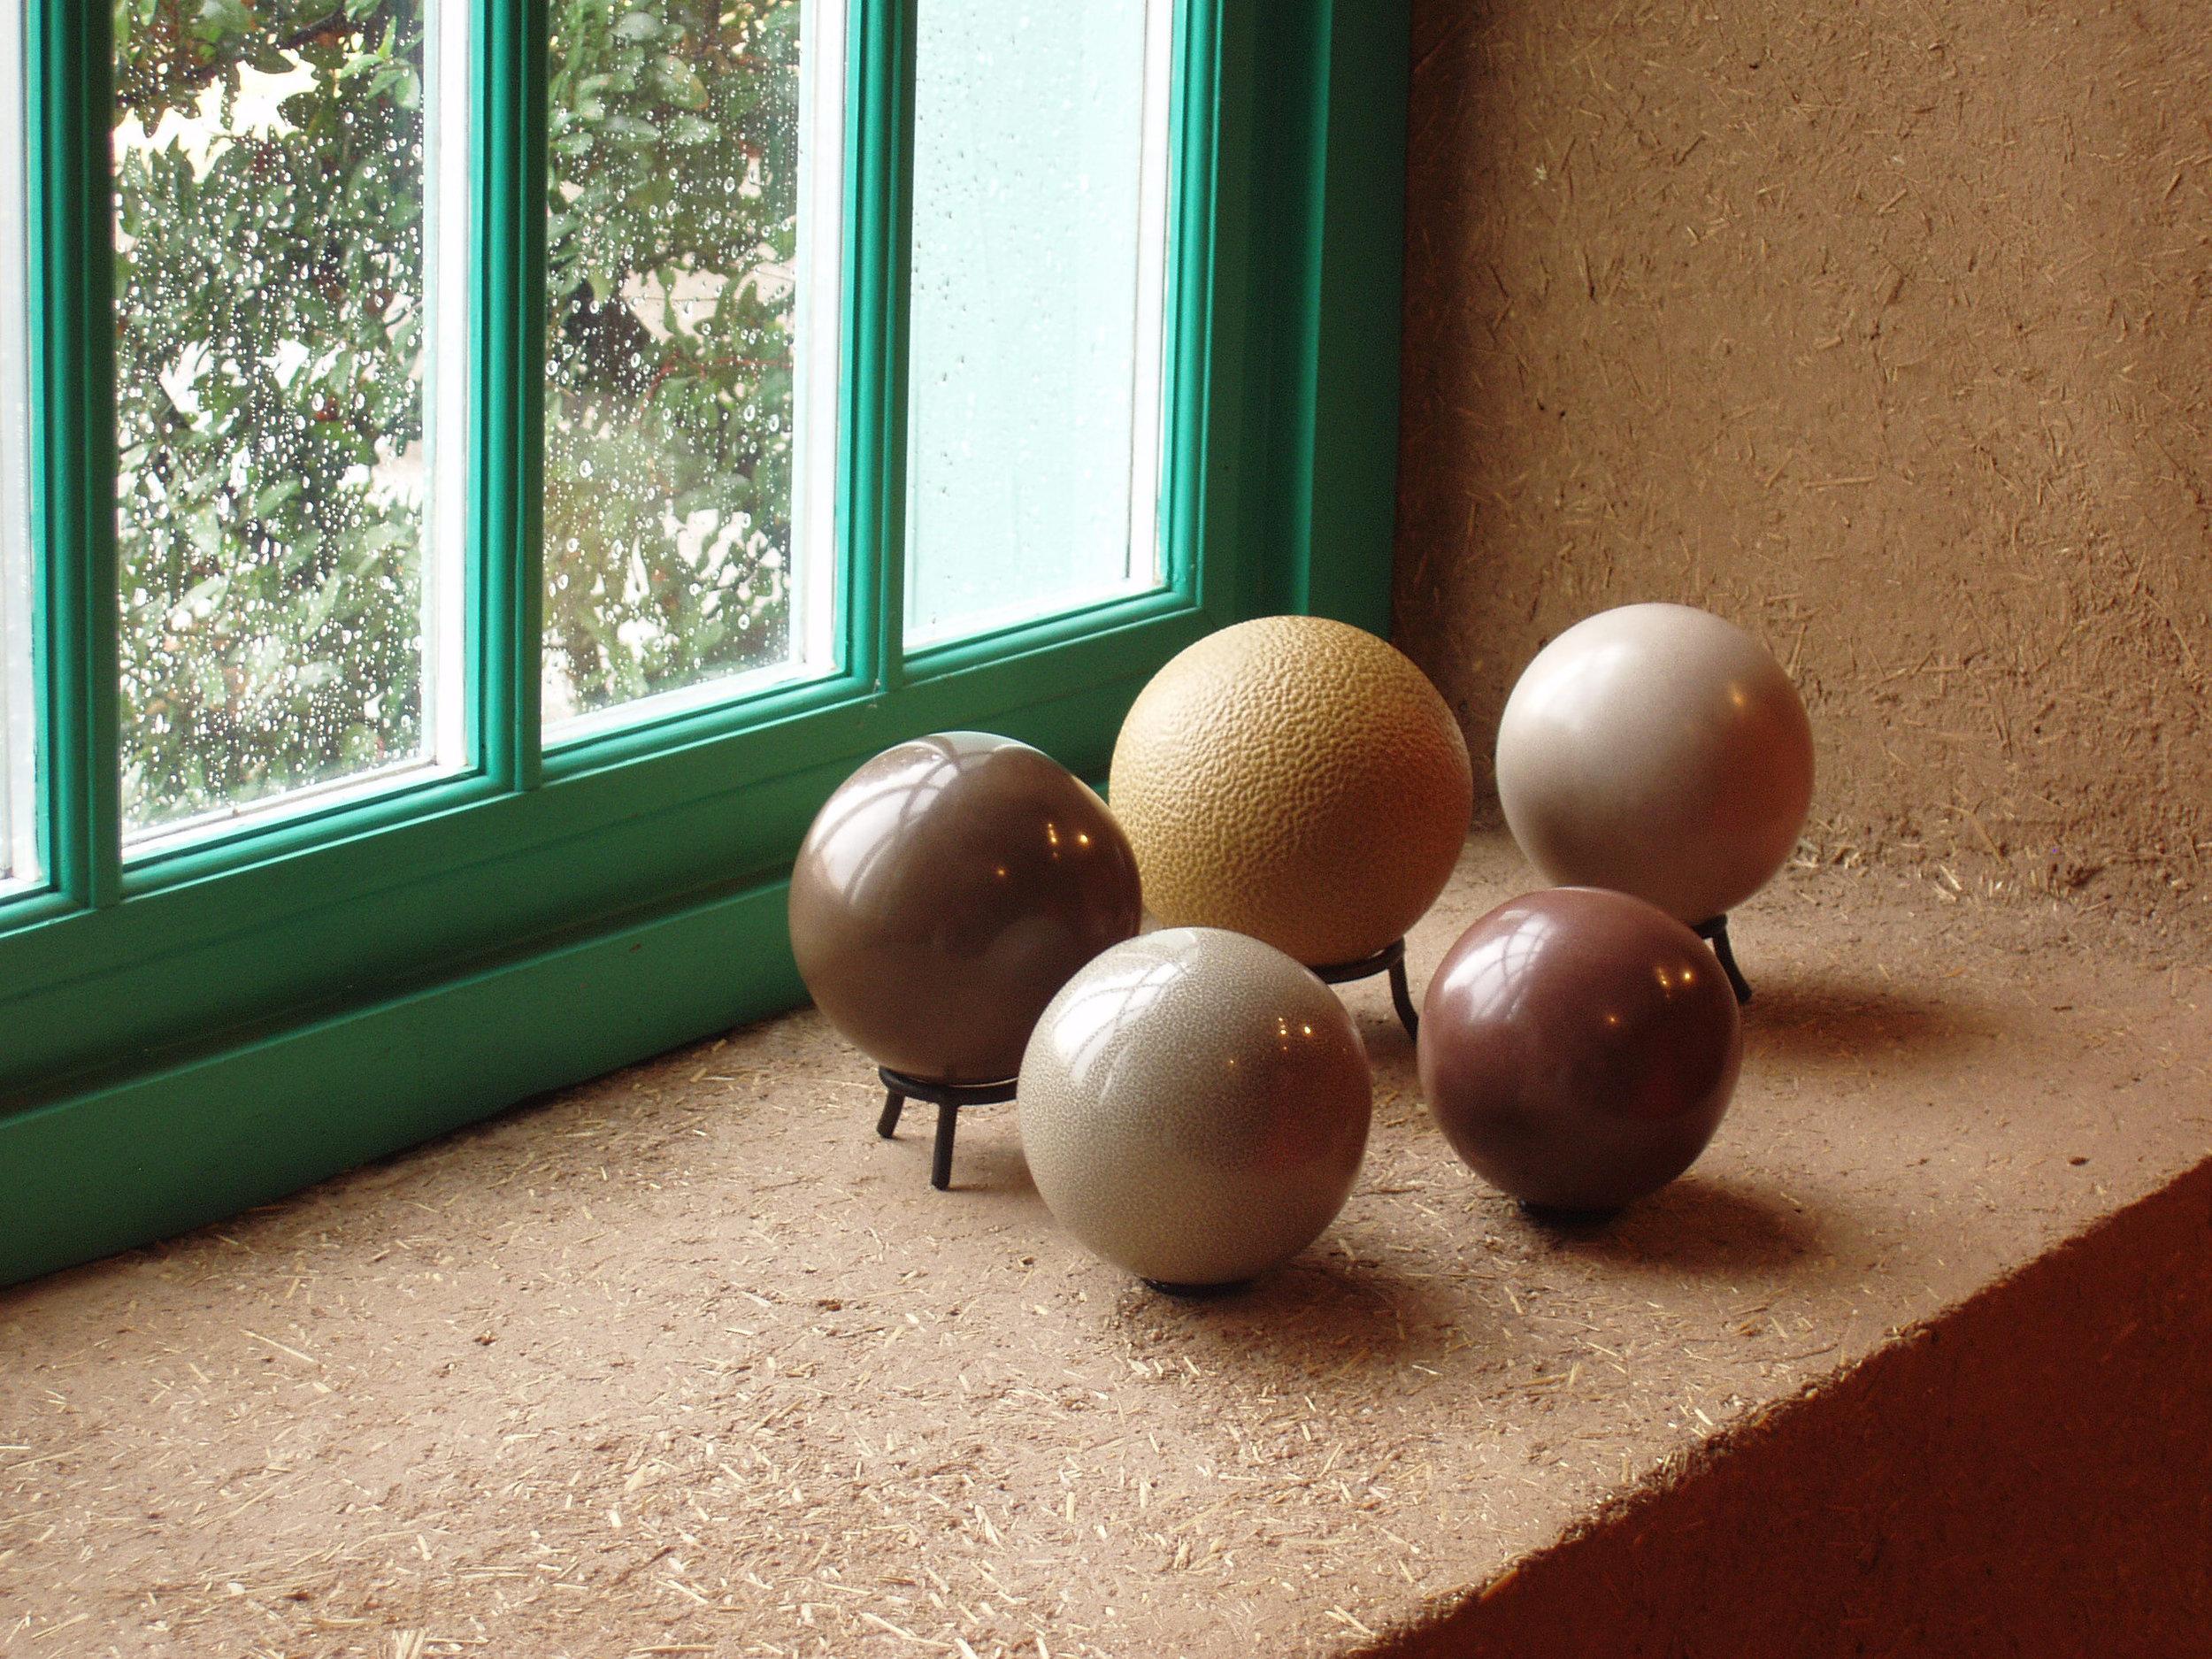 Selby Fleetwood Gallery | Santa Fe, New Mexico